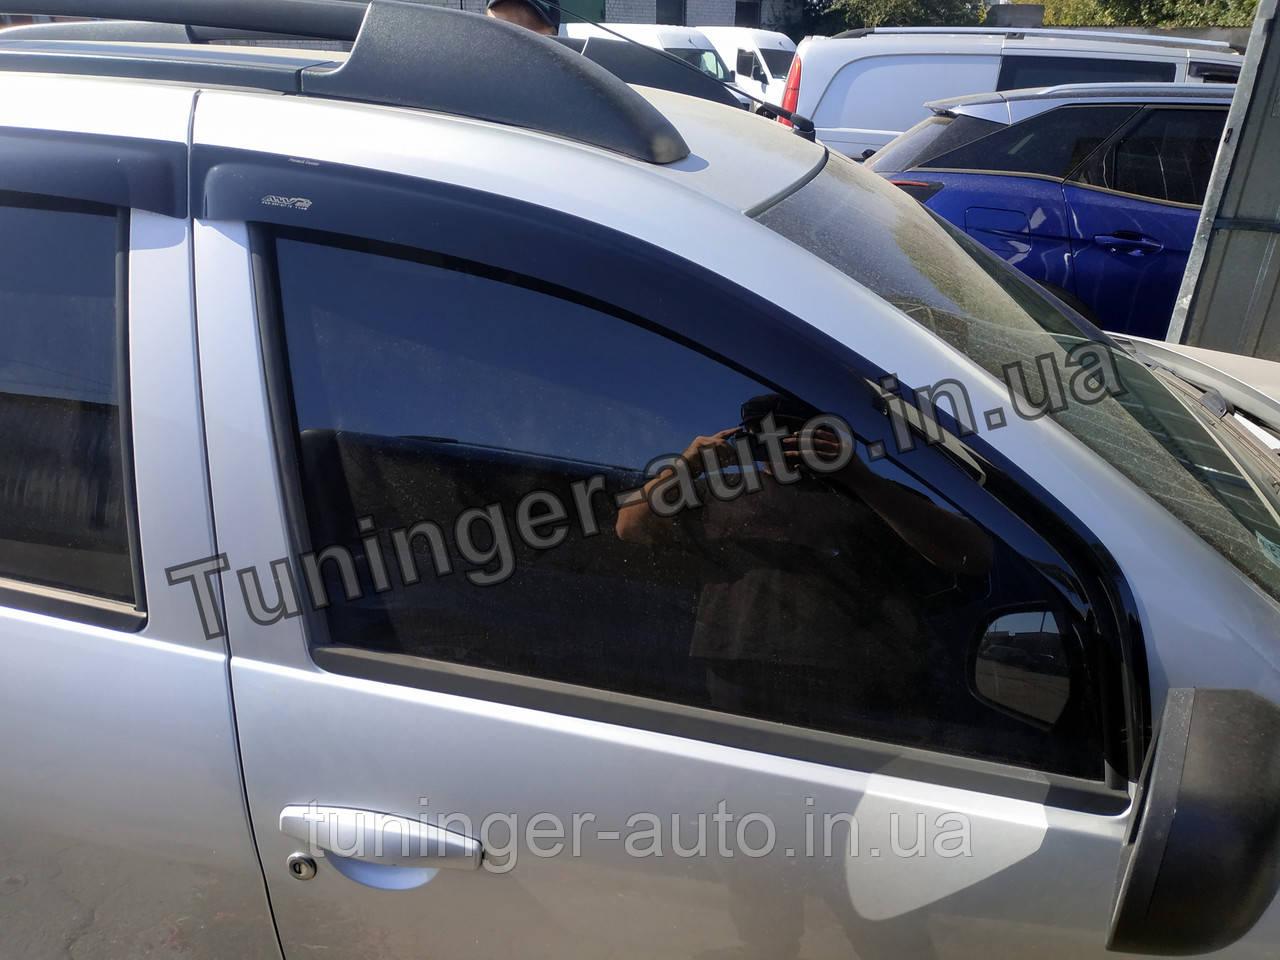 Ветровики, дефлекторы окон Renault Duster 2010-2017 (ANV)